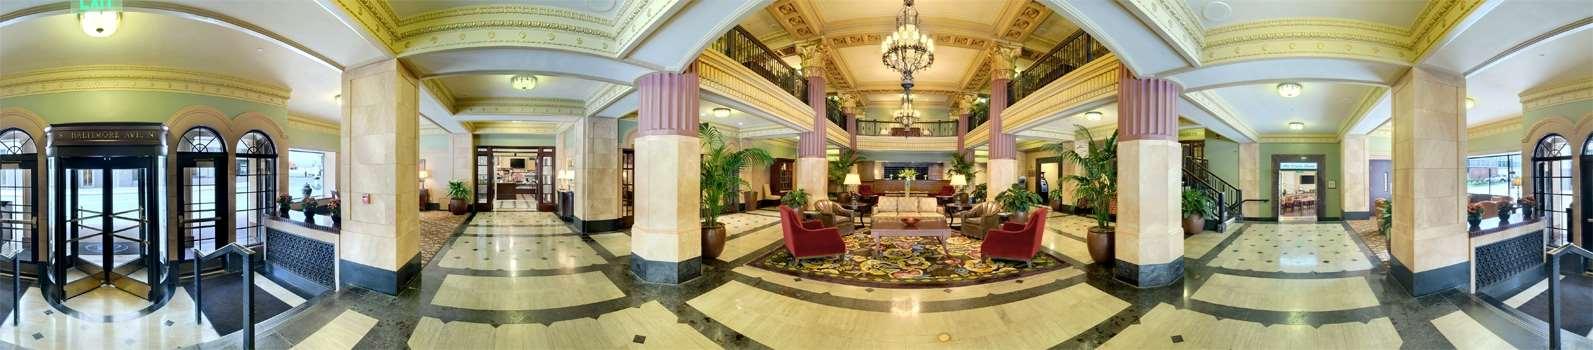 Hilton President Kansas City image 6